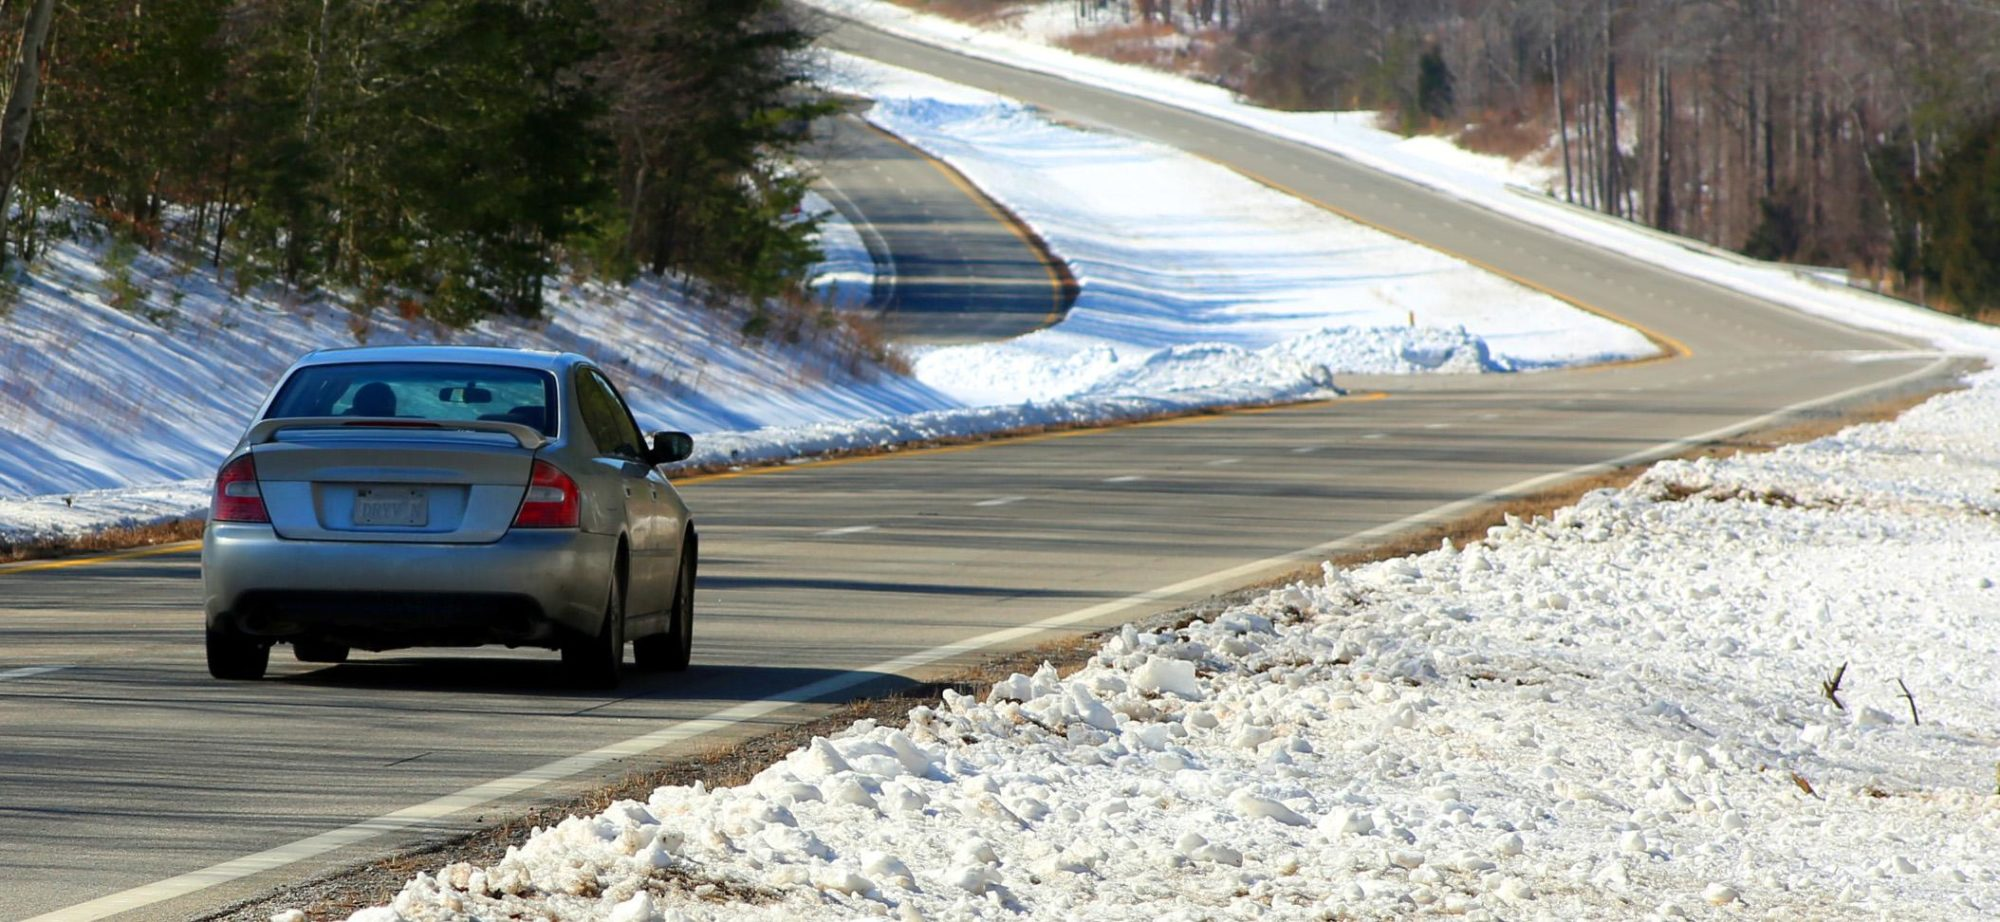 Winter-Drive | Colorado living tips | Vita blog